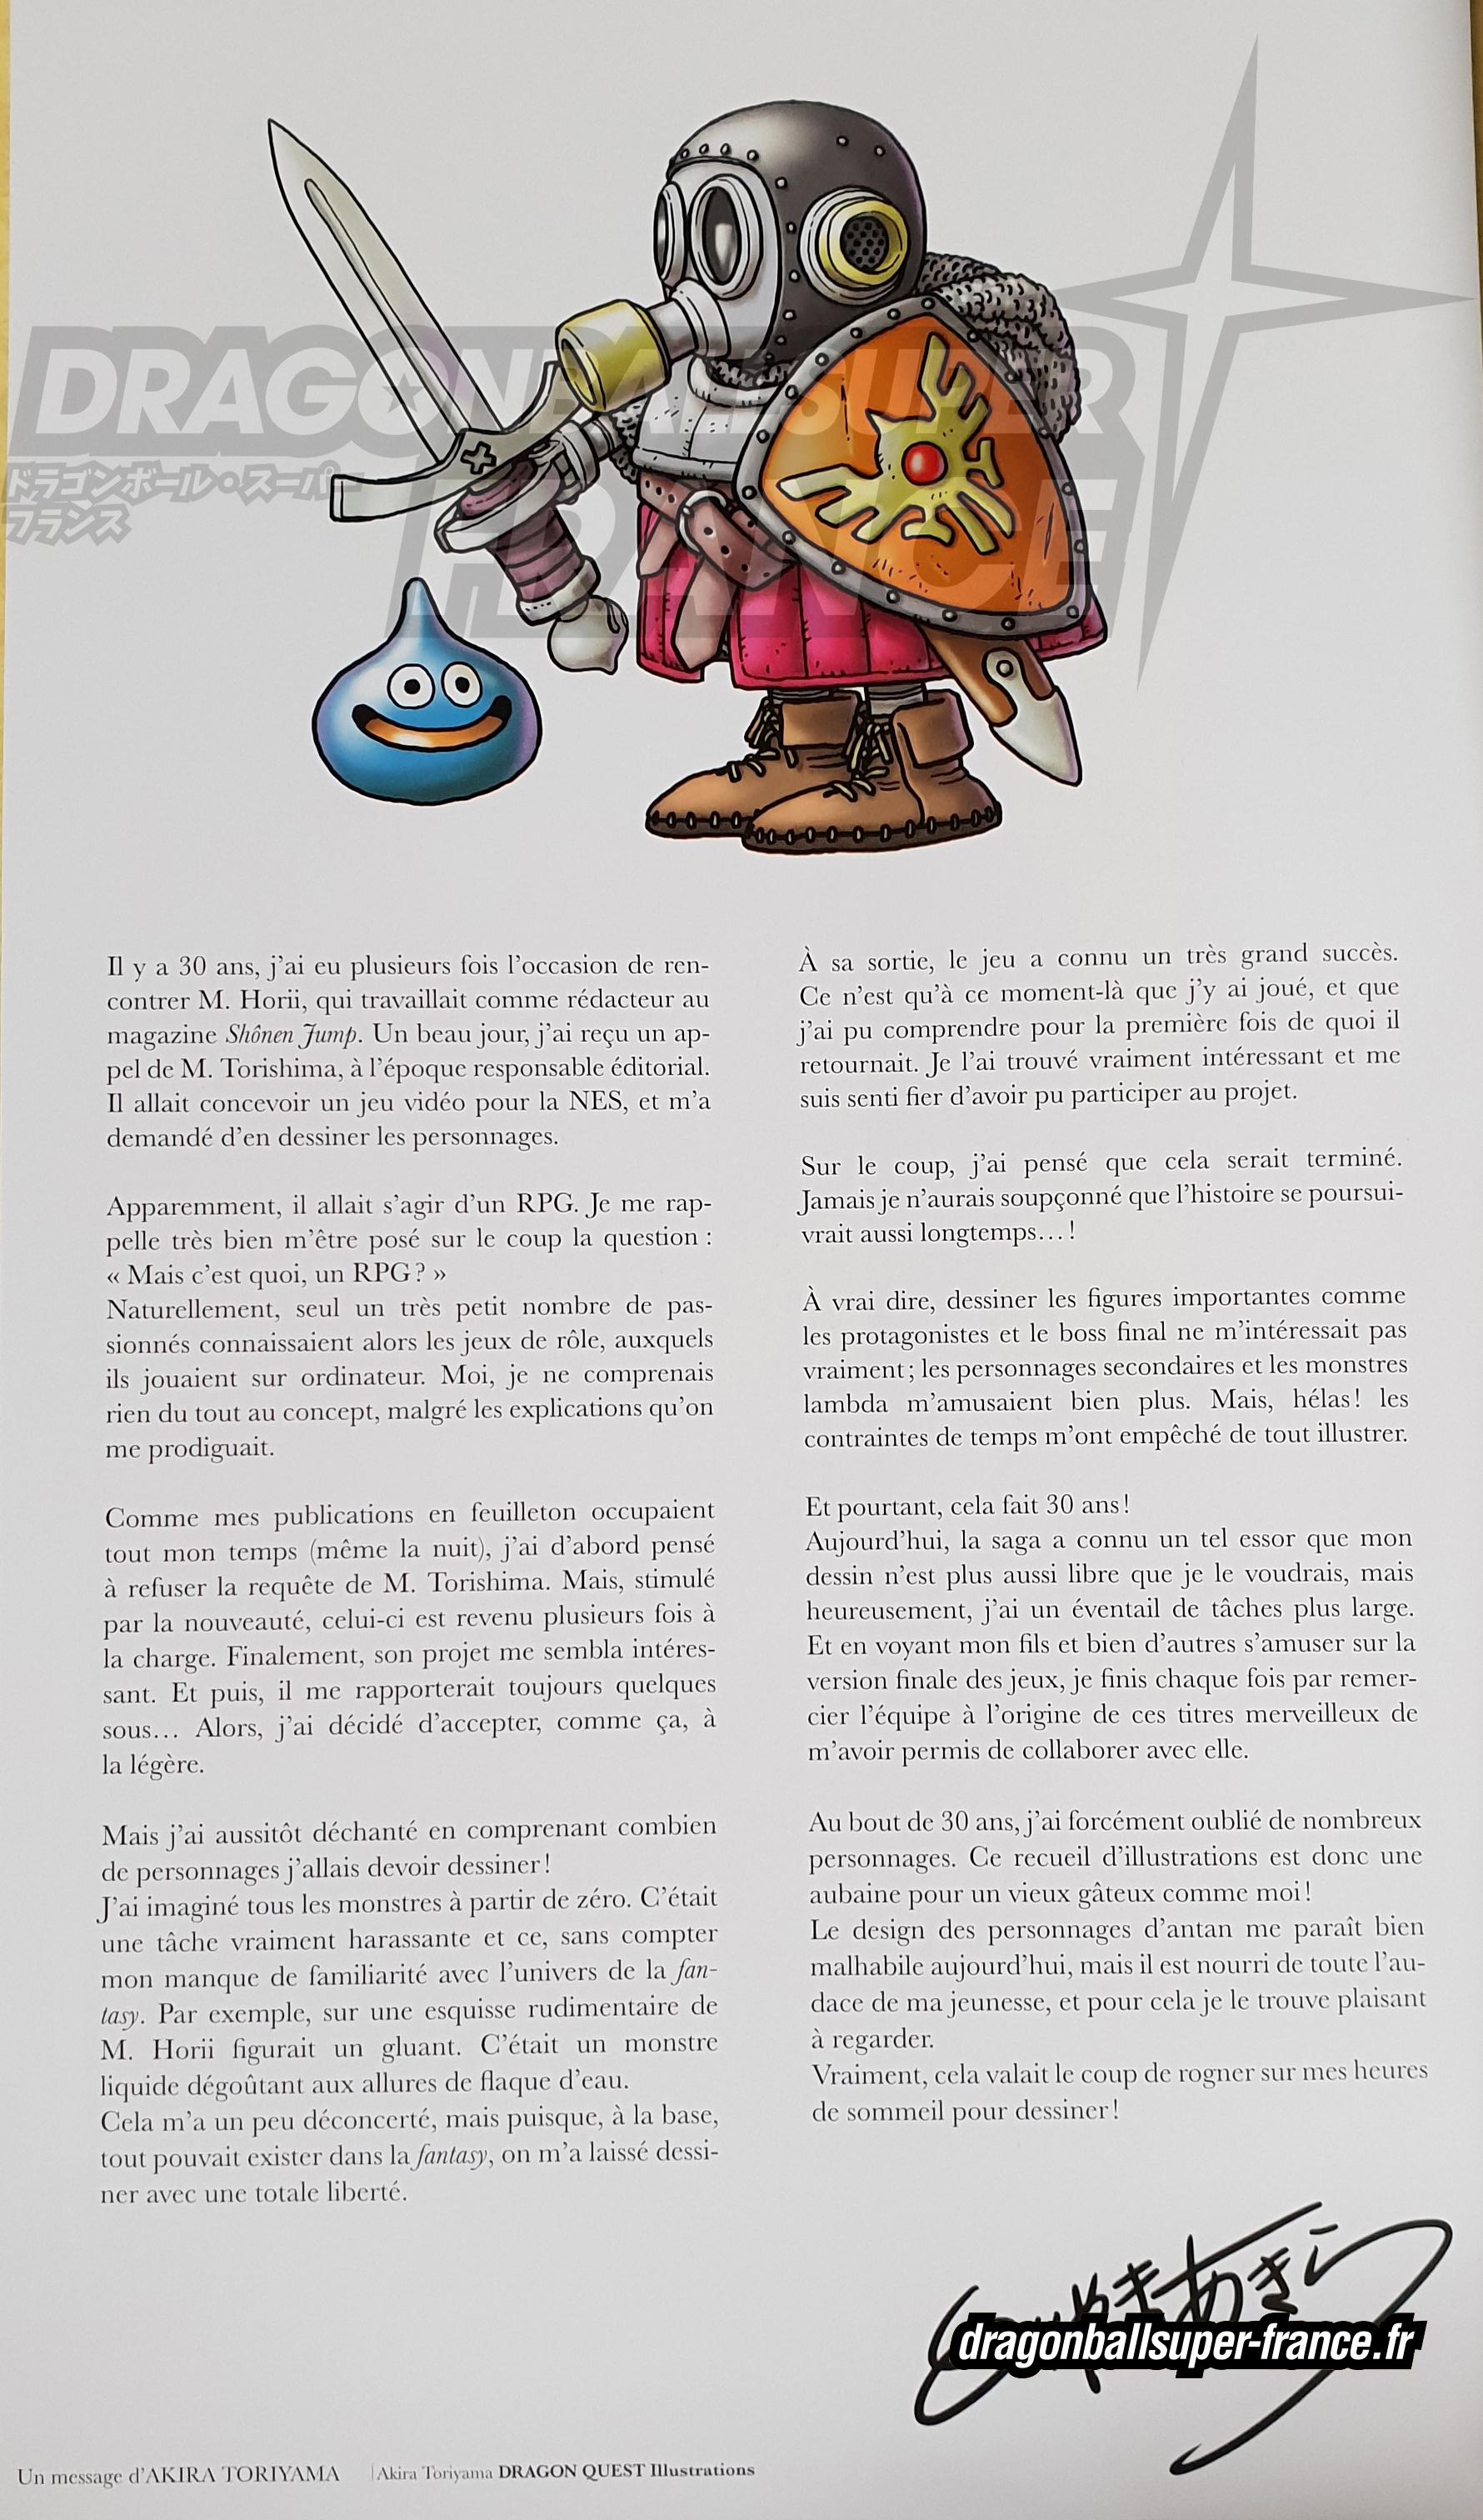 Message d'Akira Toriyama dans le livre Dragon Quest Illustrations